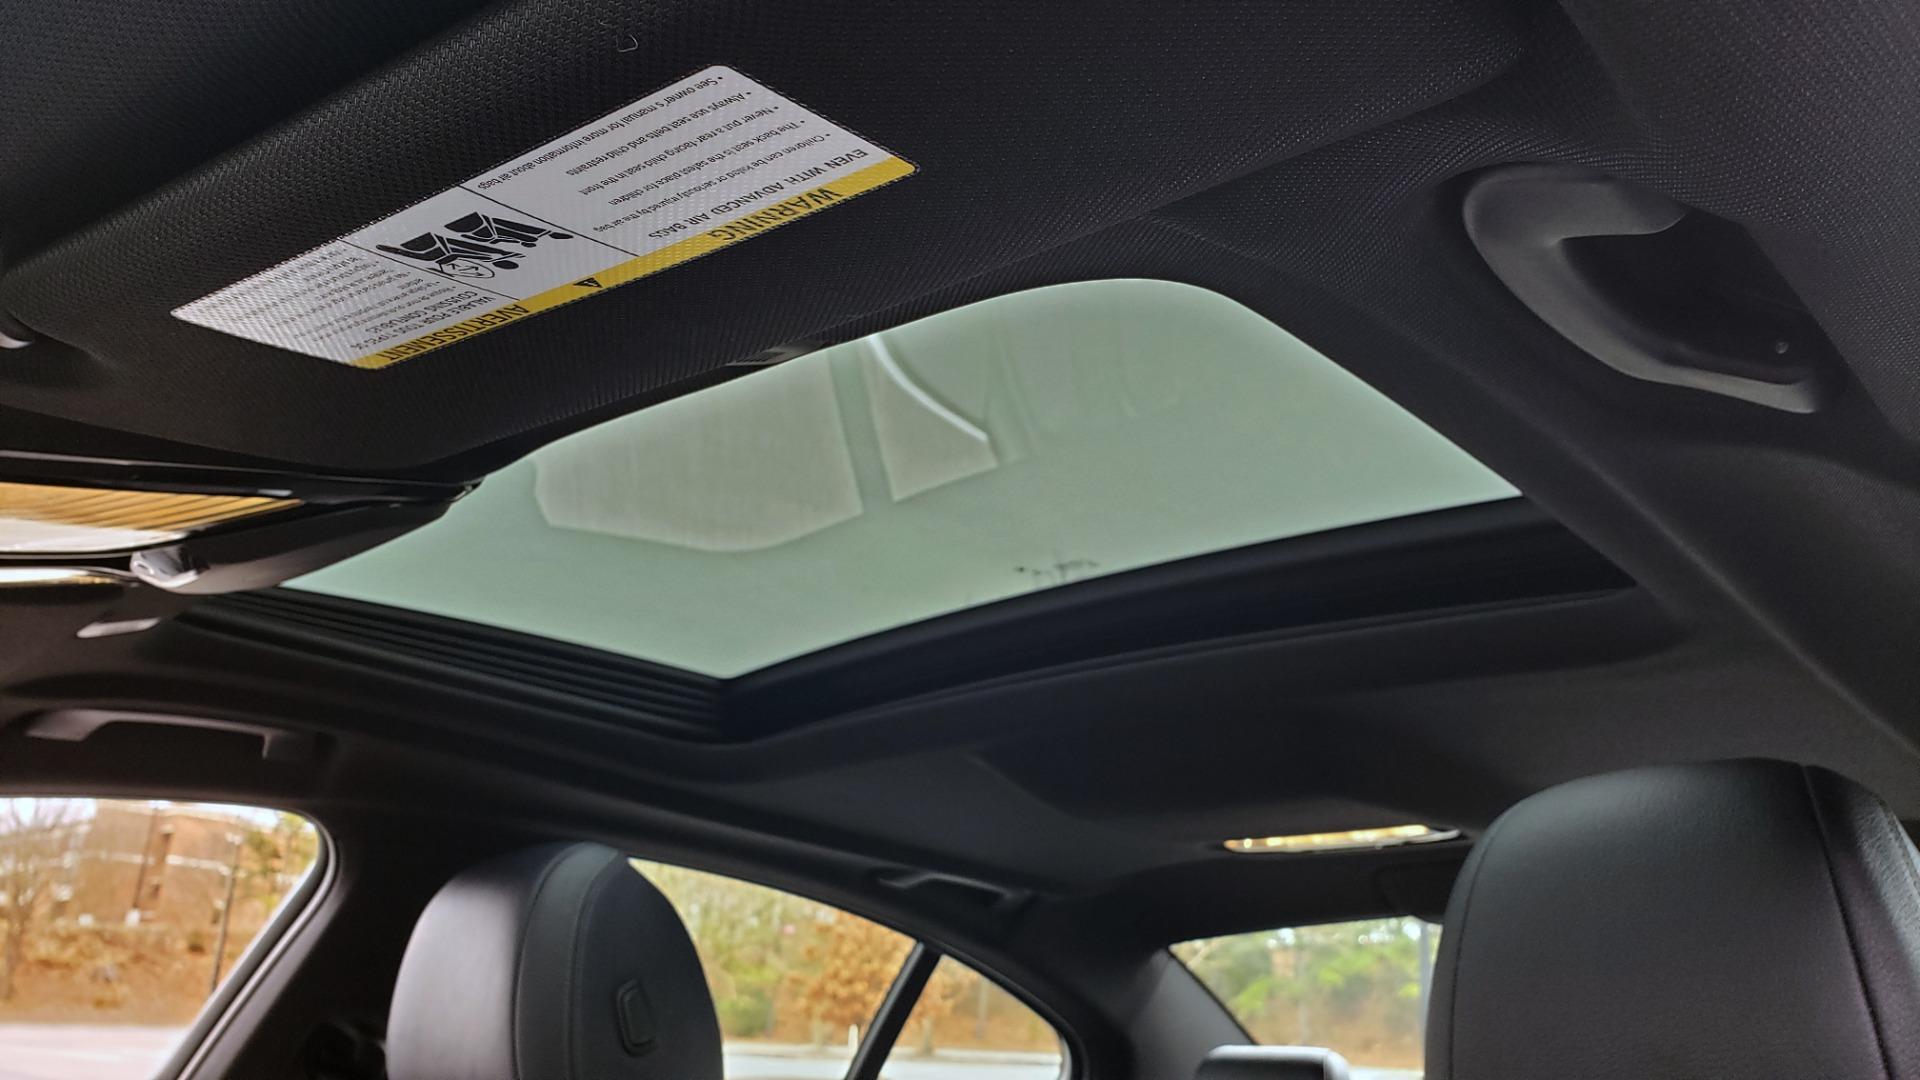 Used 2017 BMW 5 SERIES 530IXDRIVE / PREM PKG / DRVR ASST PLUS / CLD WTHR / APPLE CARPLAY for sale Sold at Formula Imports in Charlotte NC 28227 56